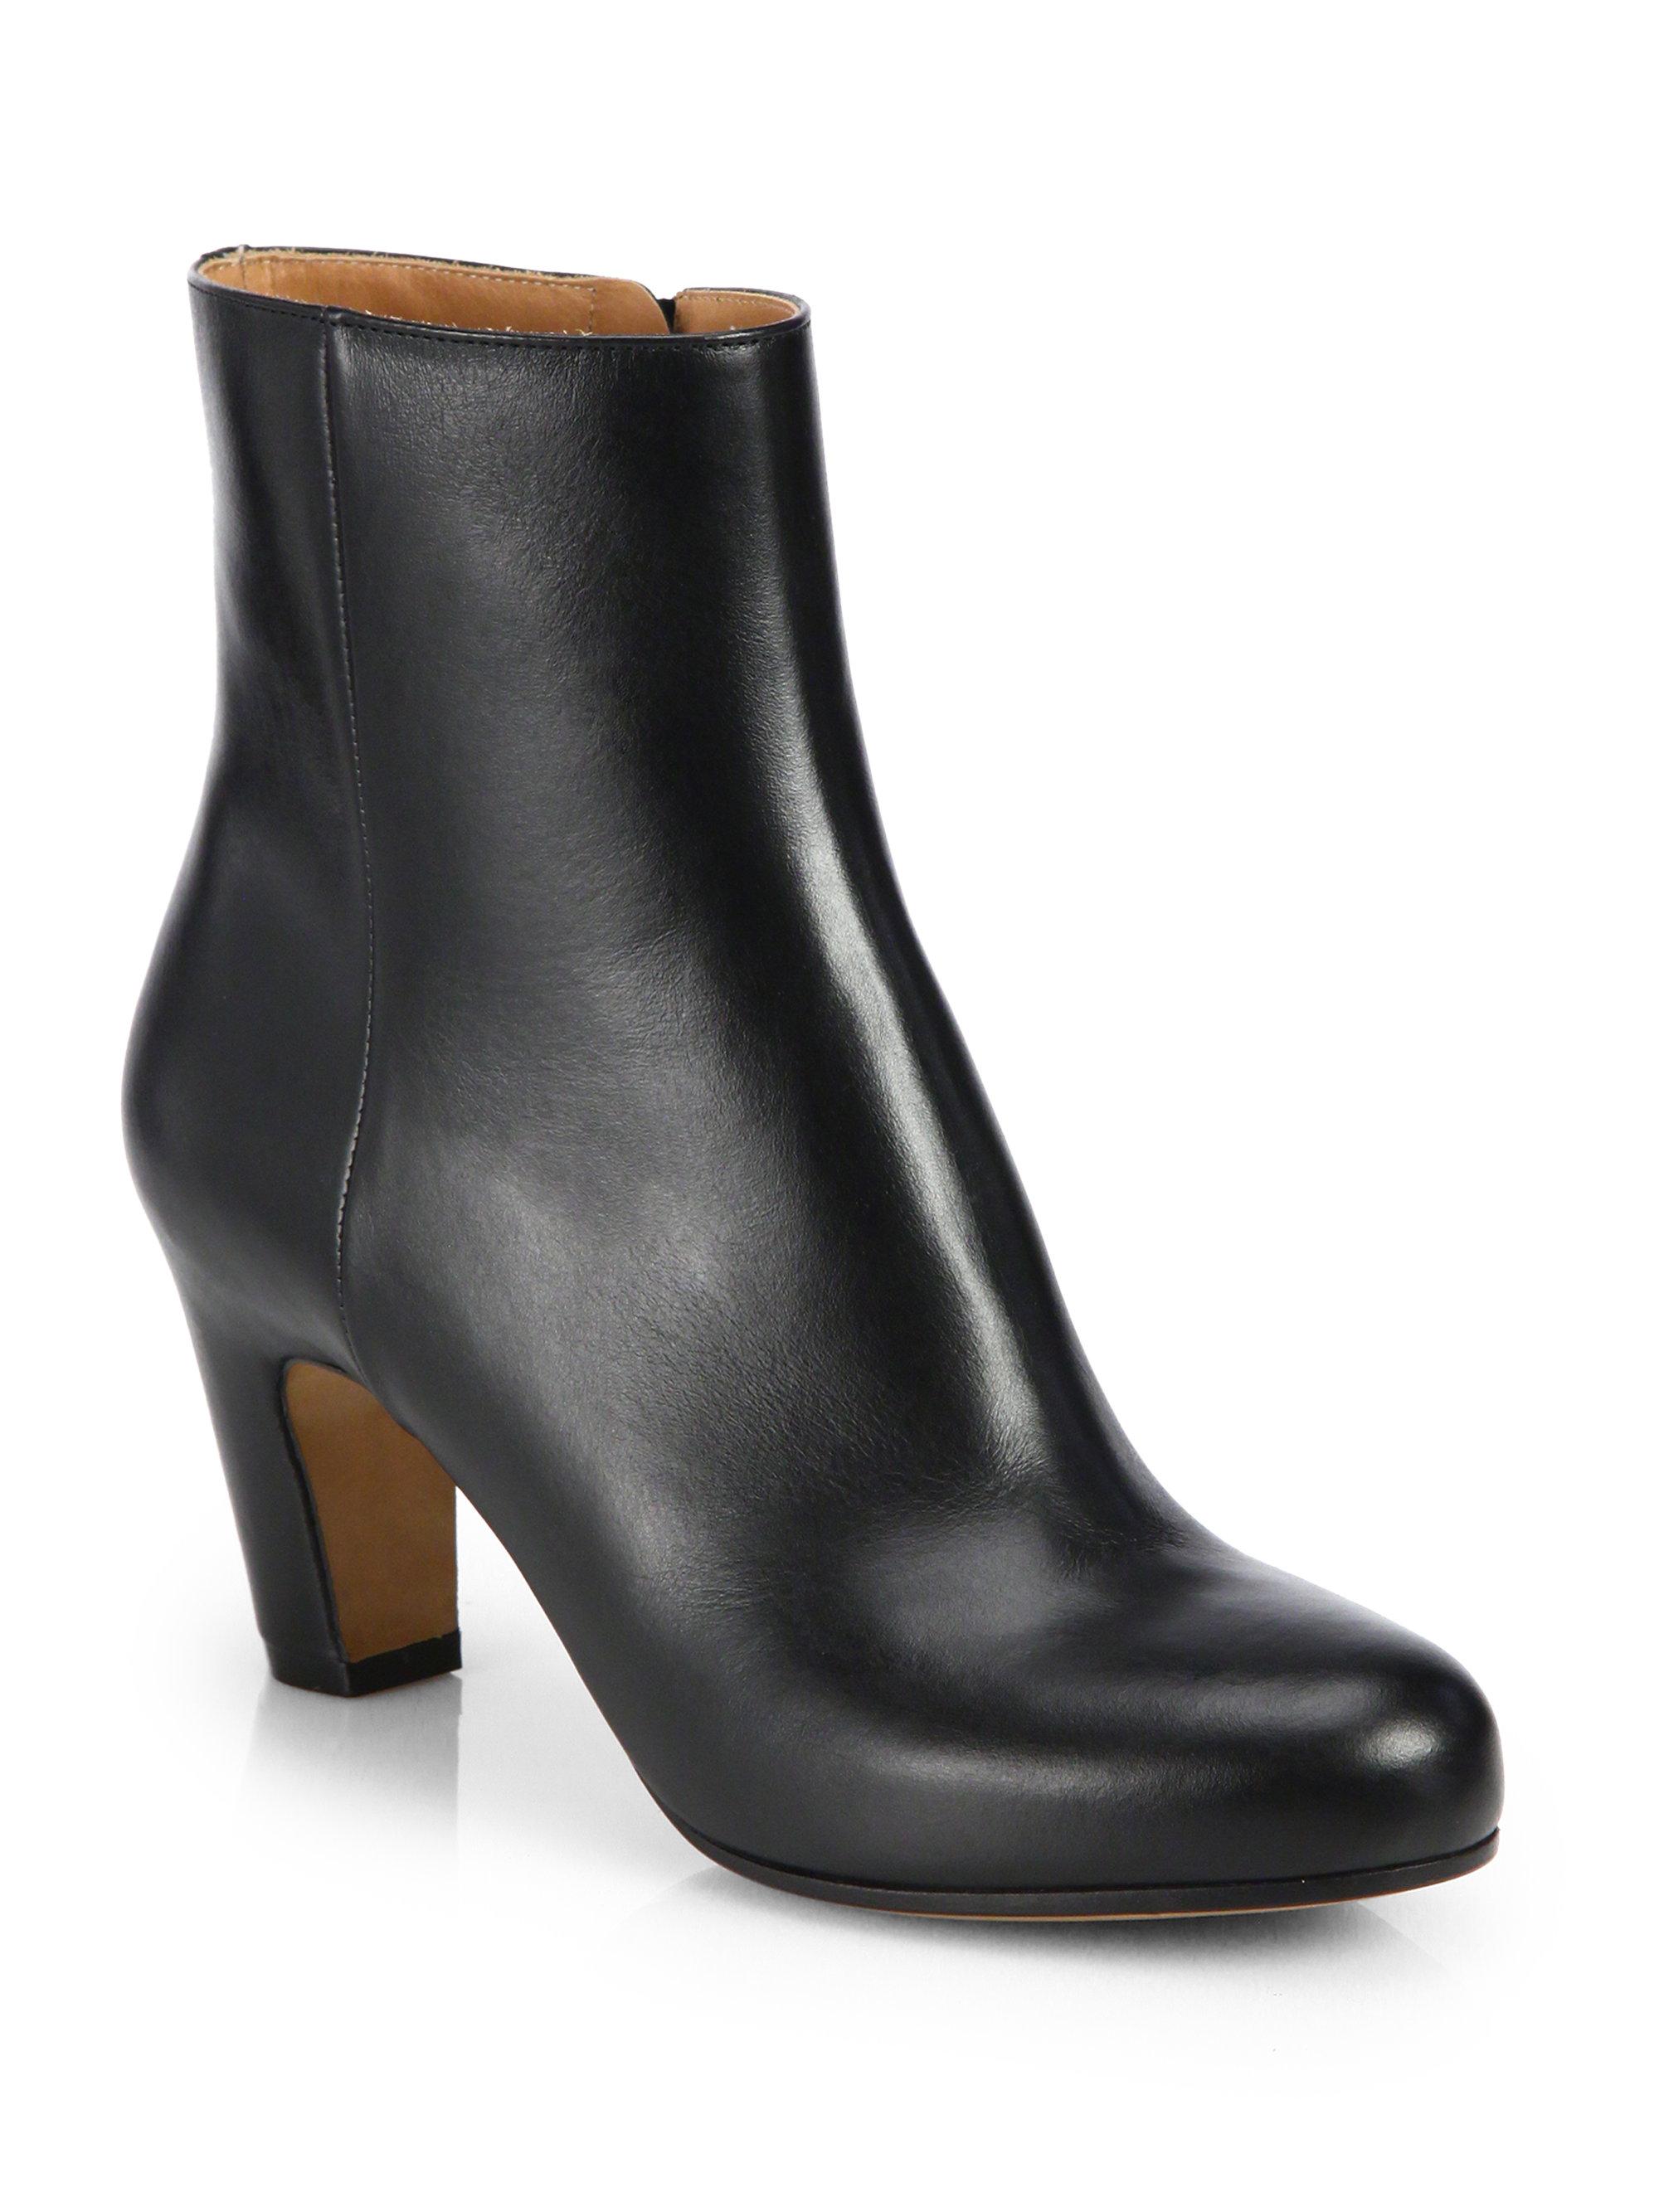 Maison Martin Margiela Suede Ankle Boots ShSeHoWi3